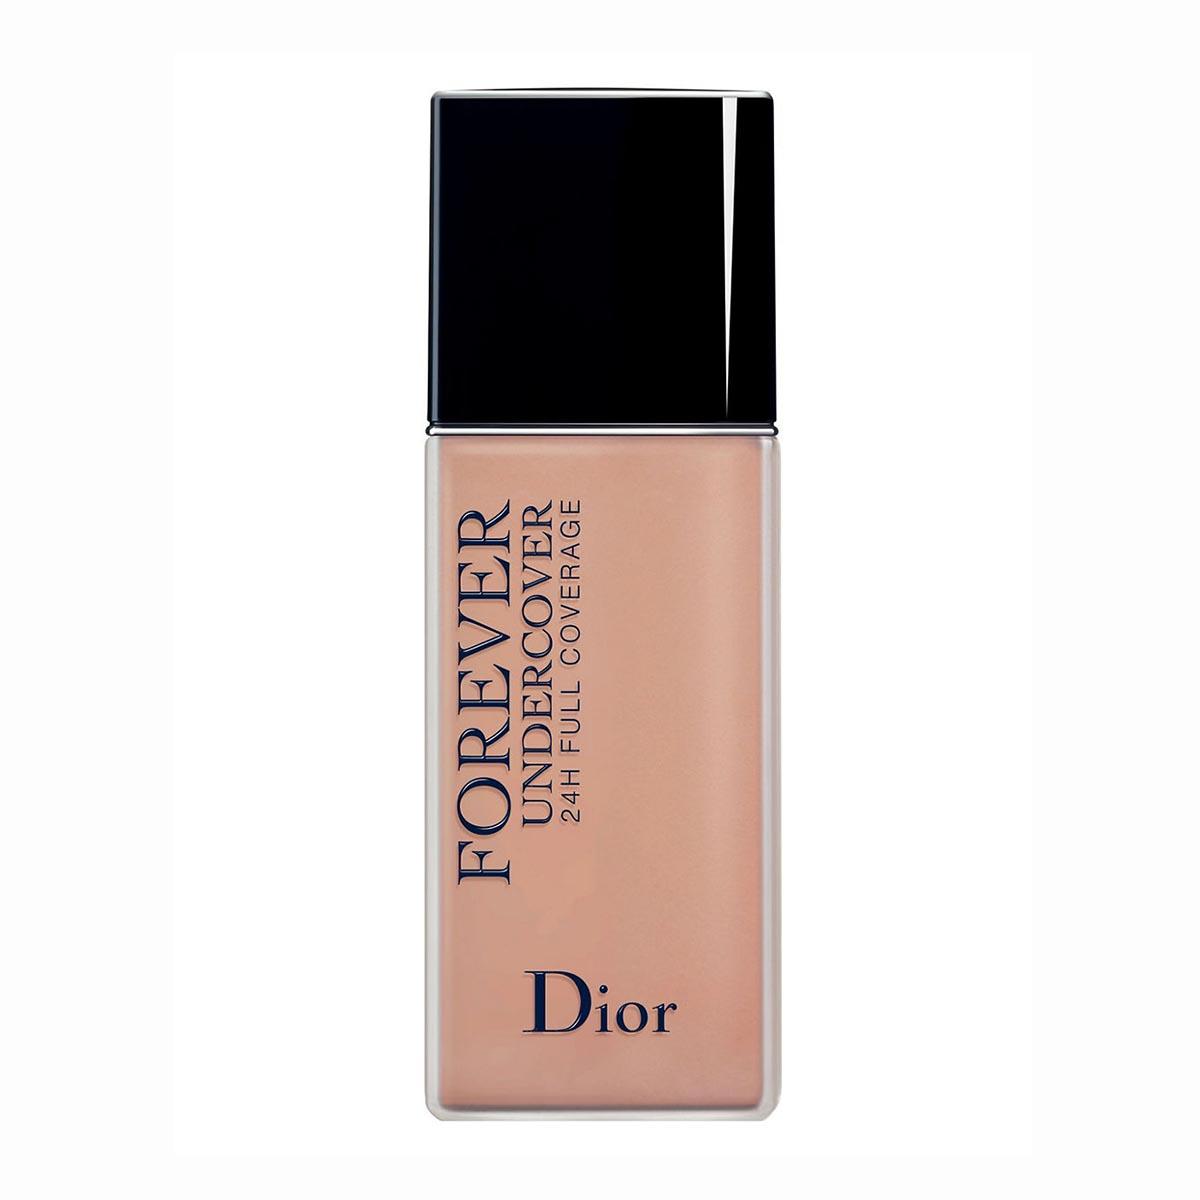 Dior diorskin forever undercover fond de teint 010